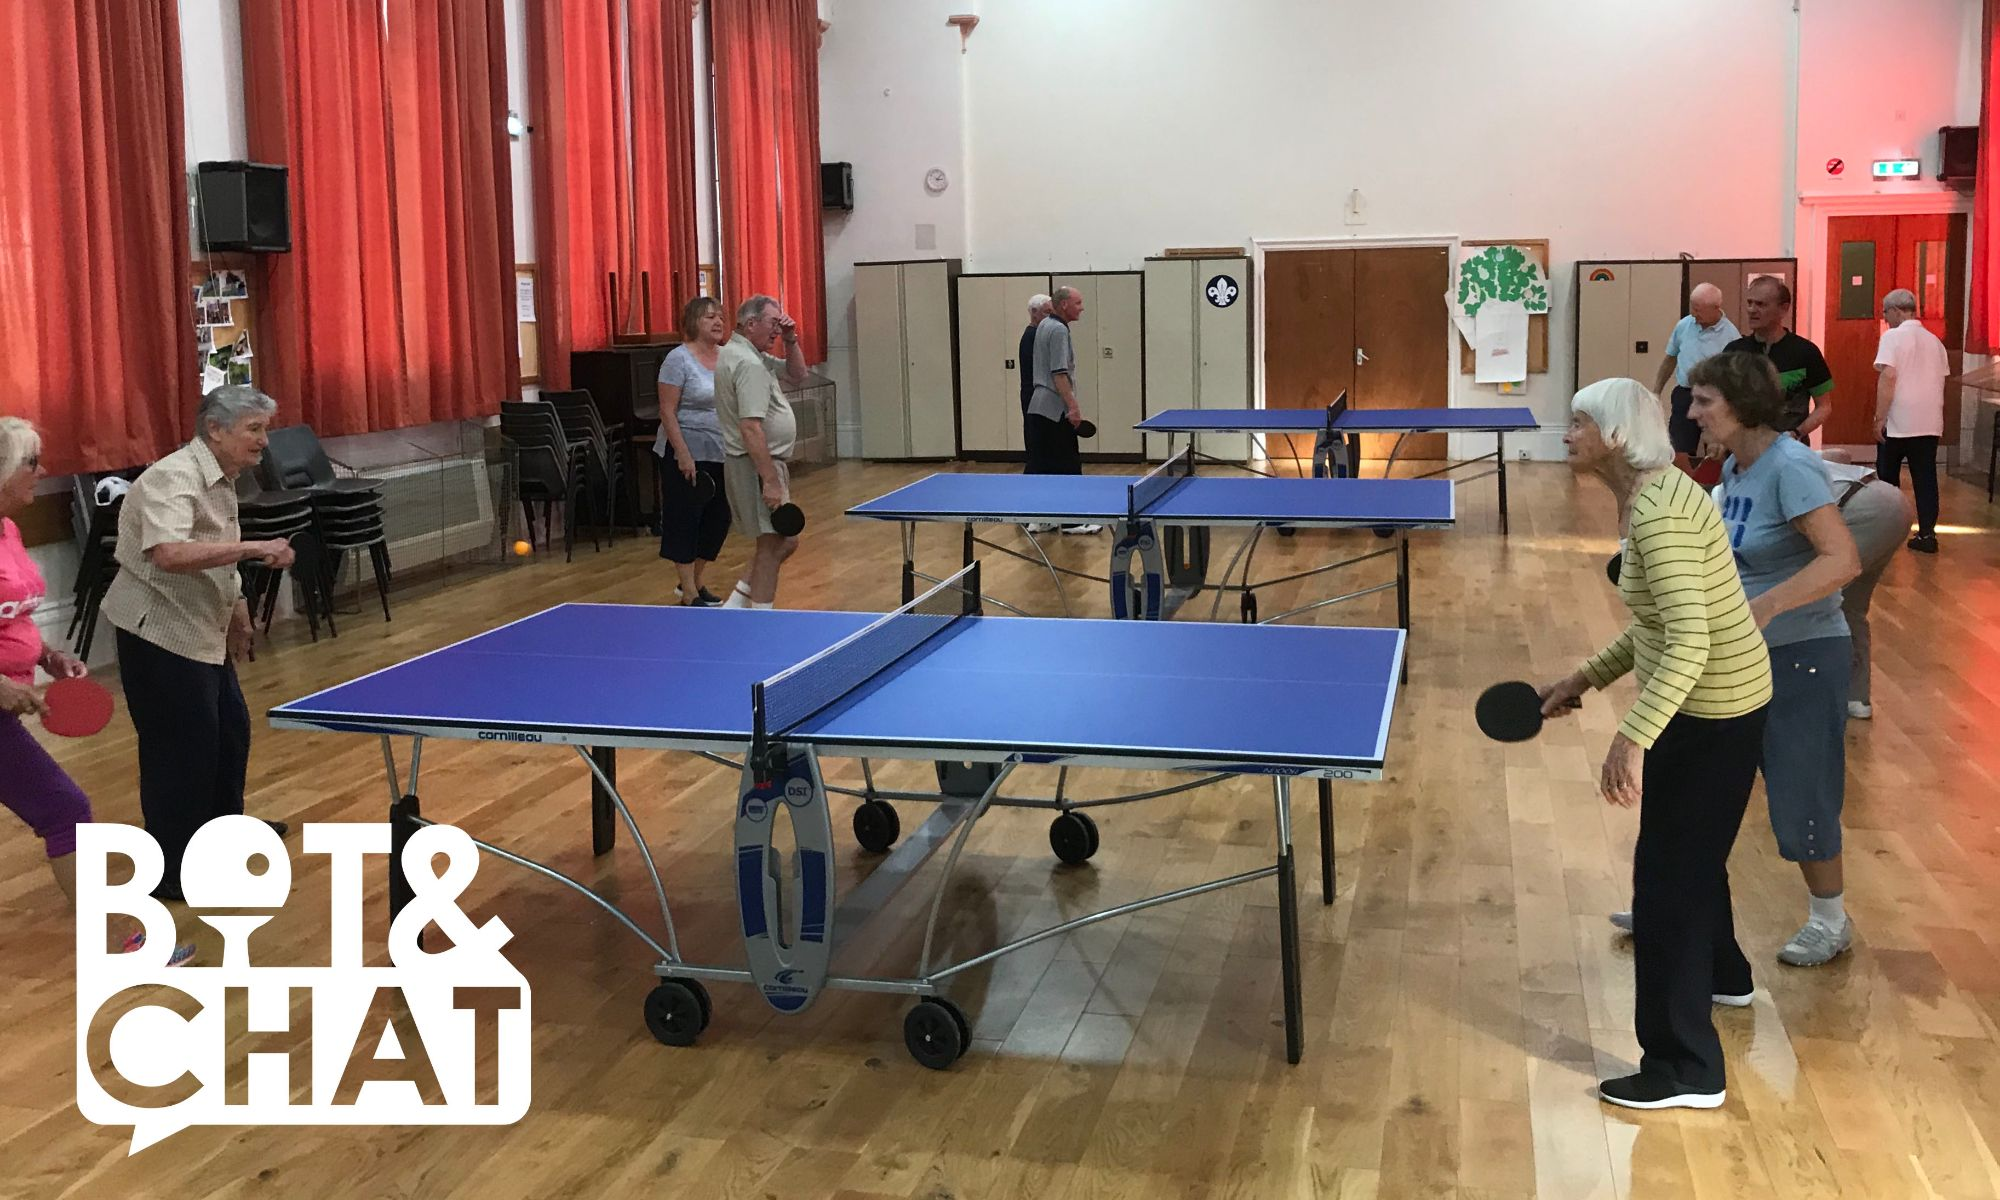 St. Cuthbert's Church Hall, Table Tennis